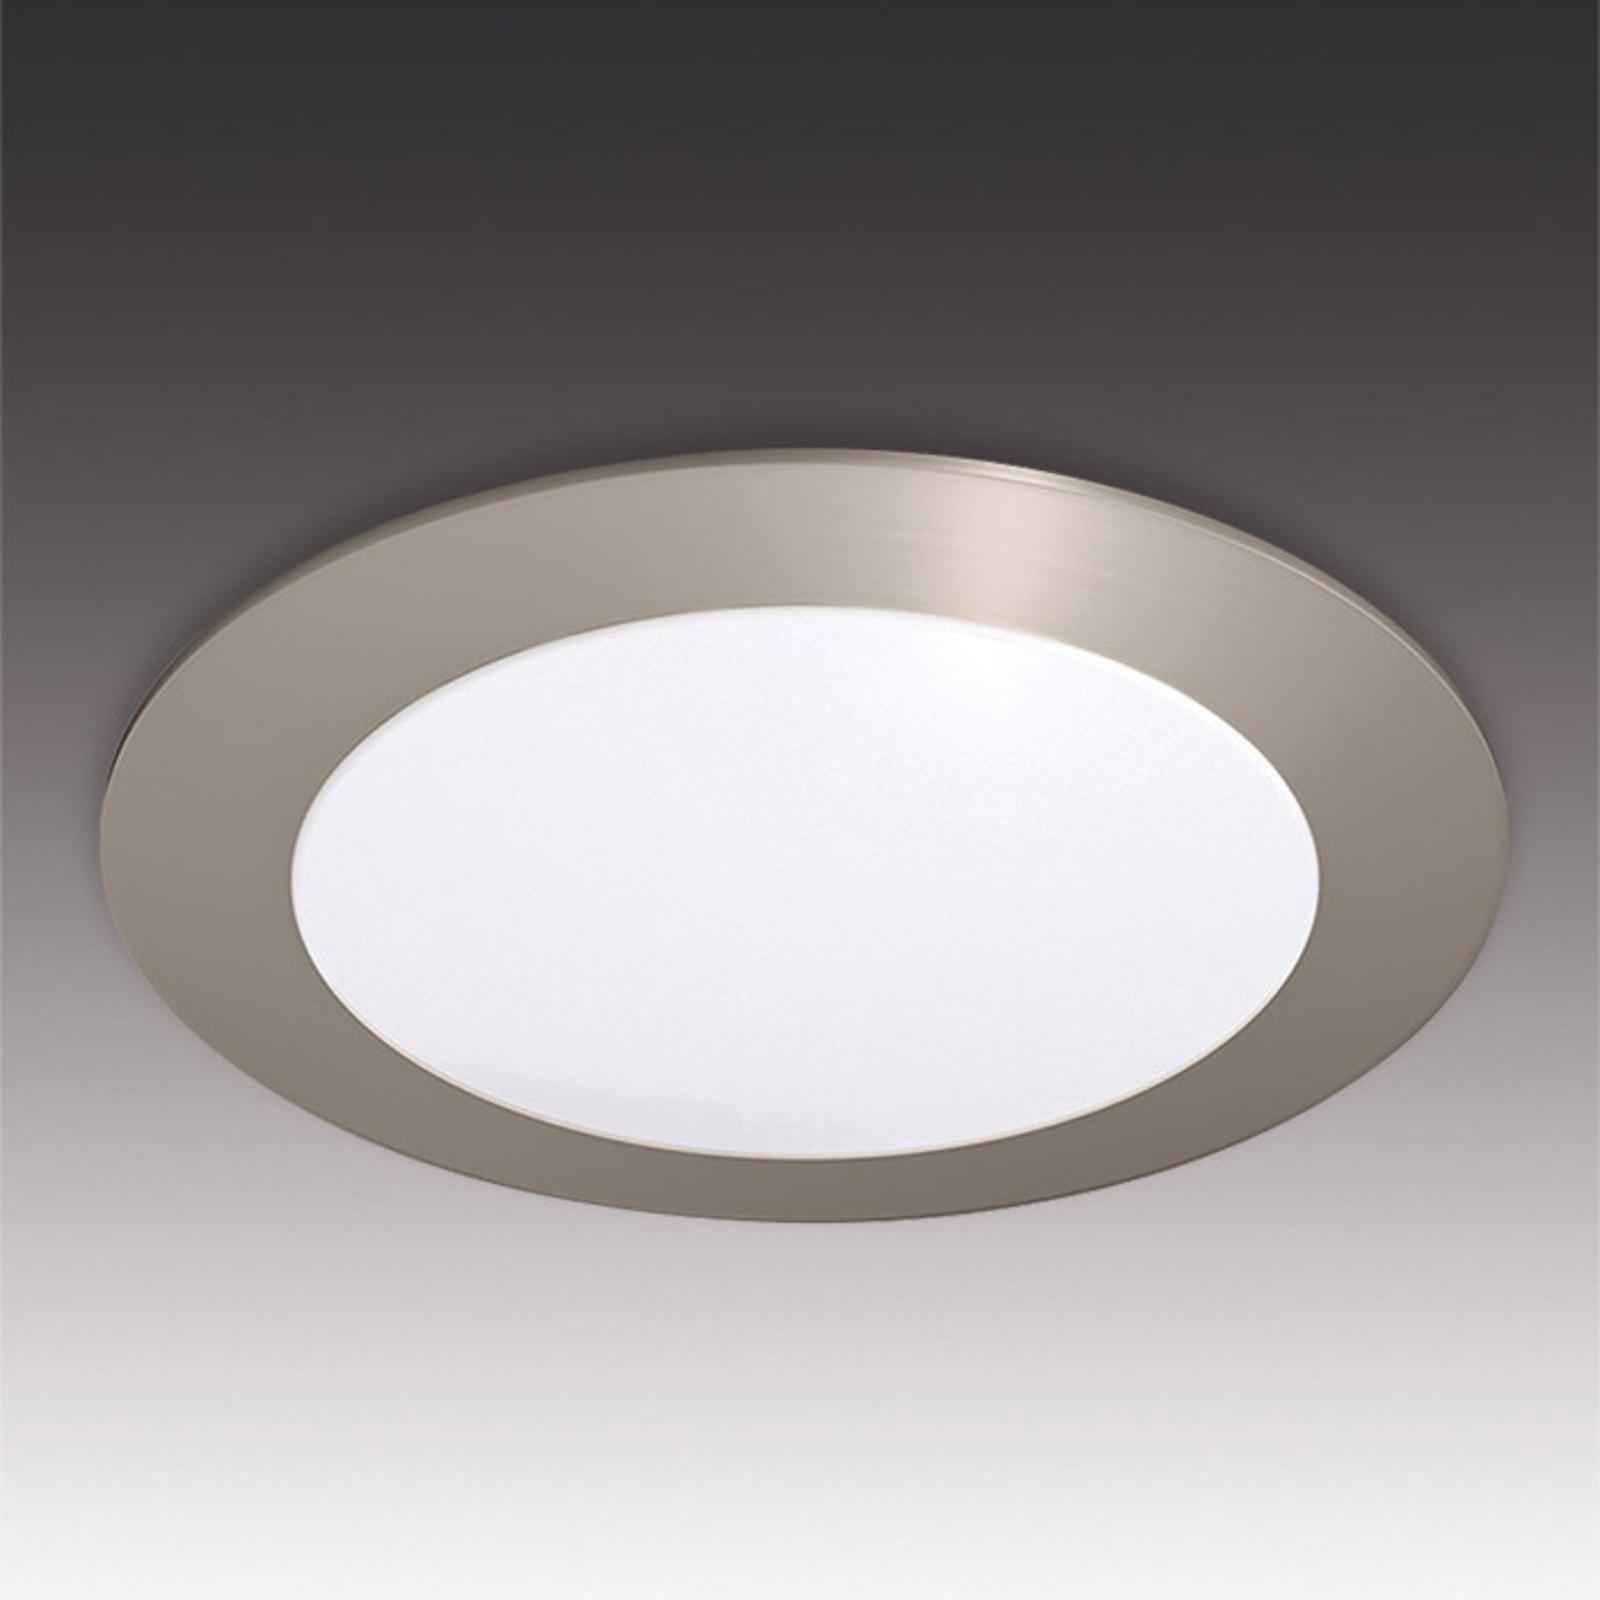 Armatur-lampe FR 68-LED